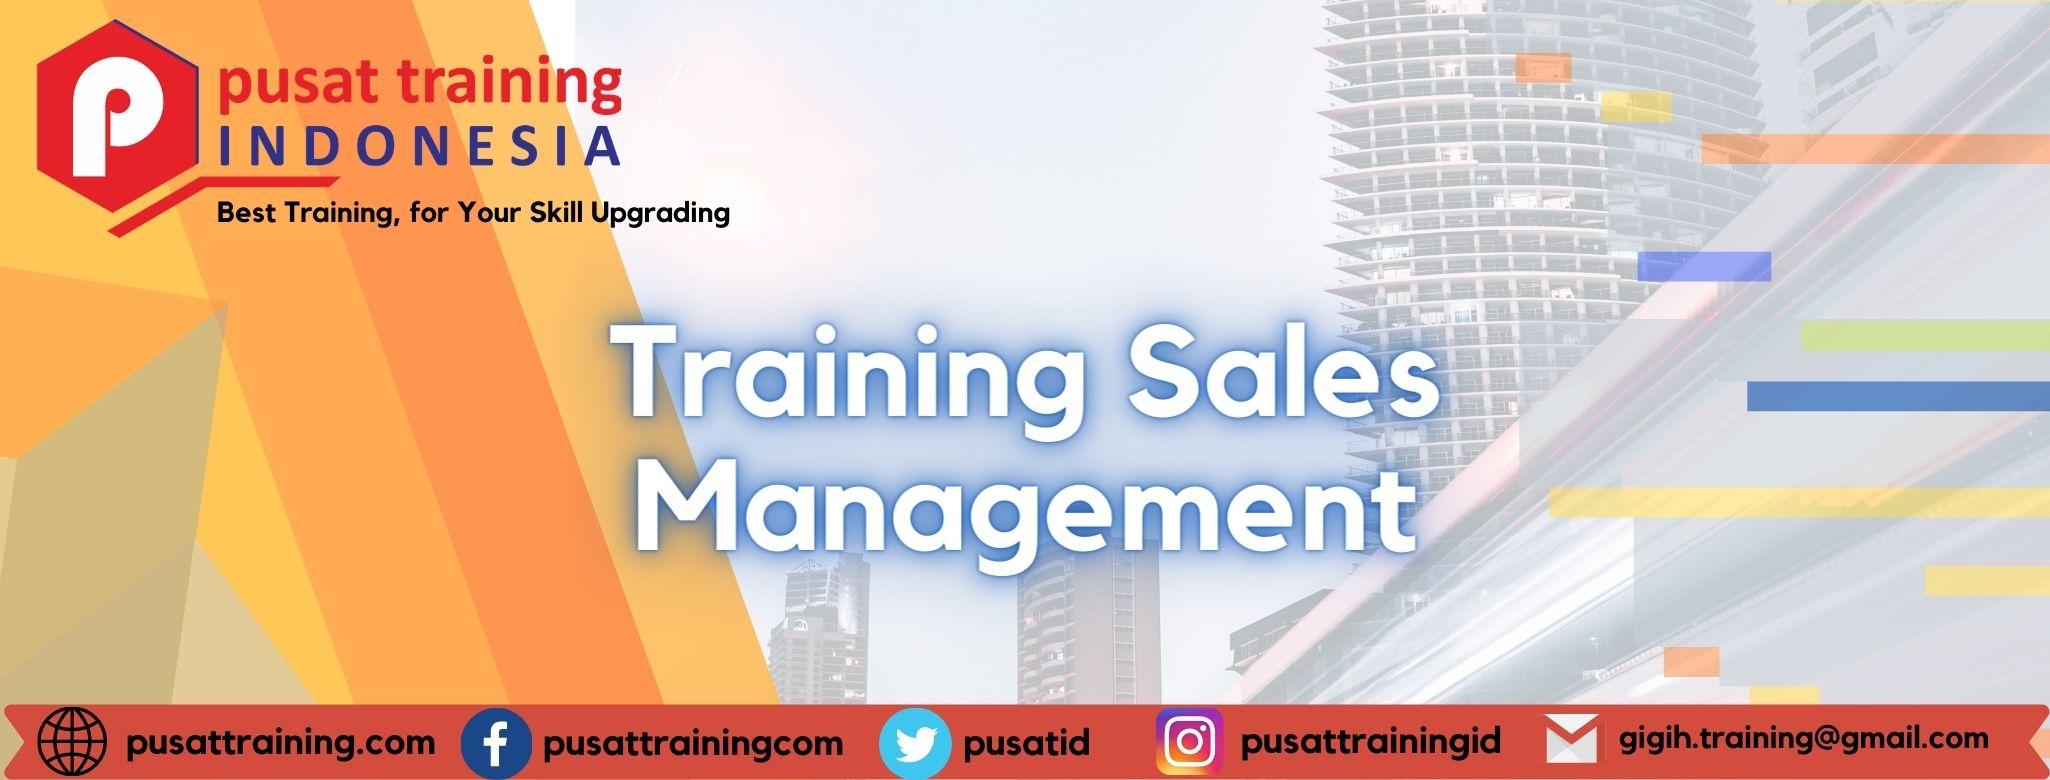 Training Sales Management